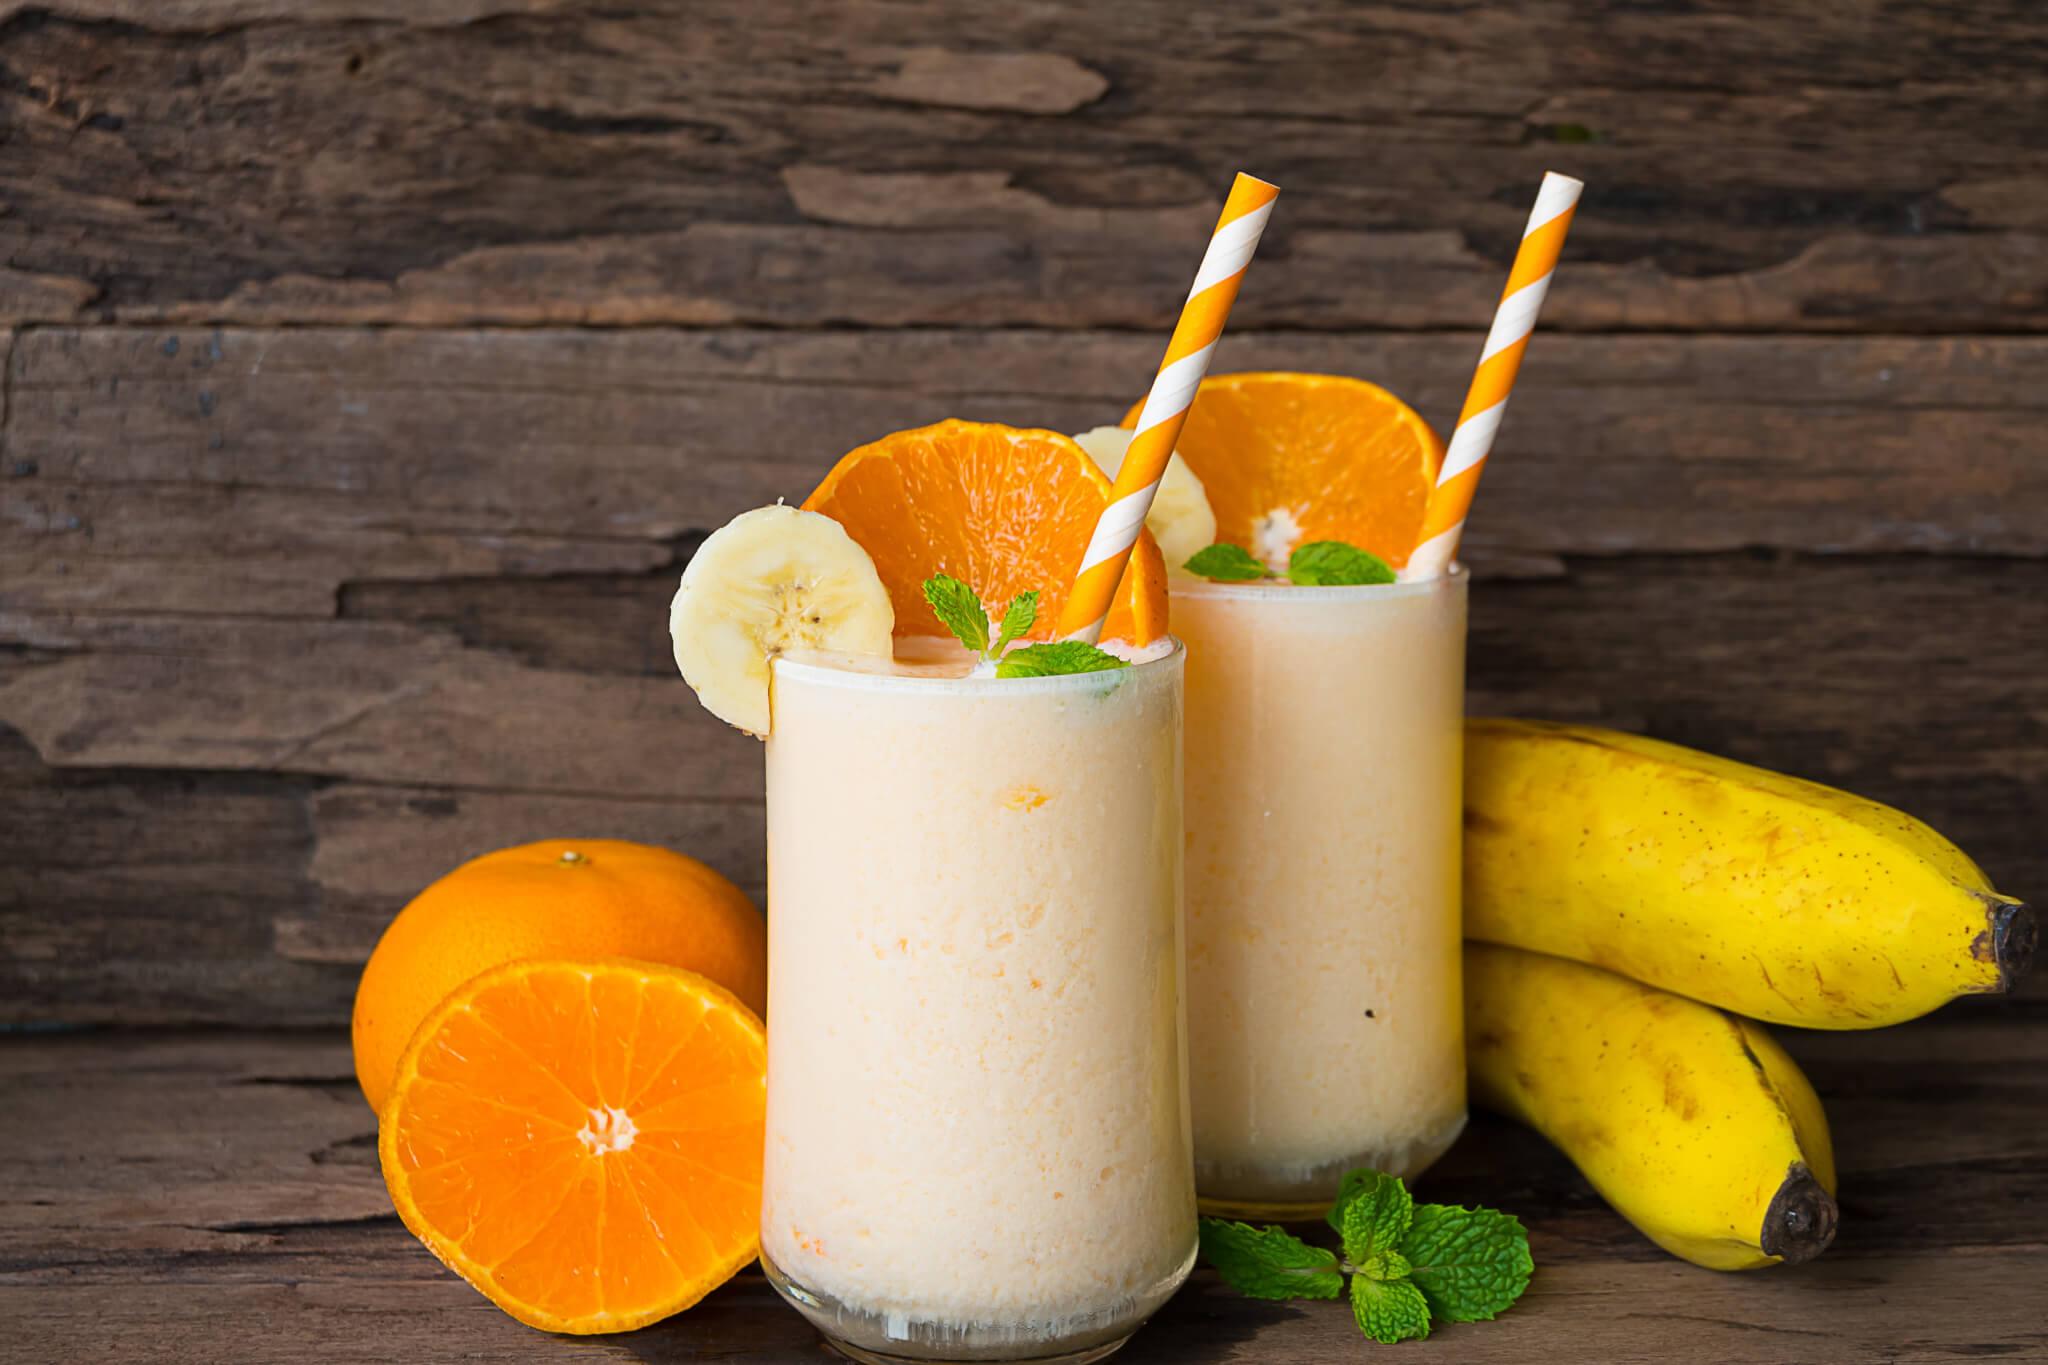 Banana and orange smoothies